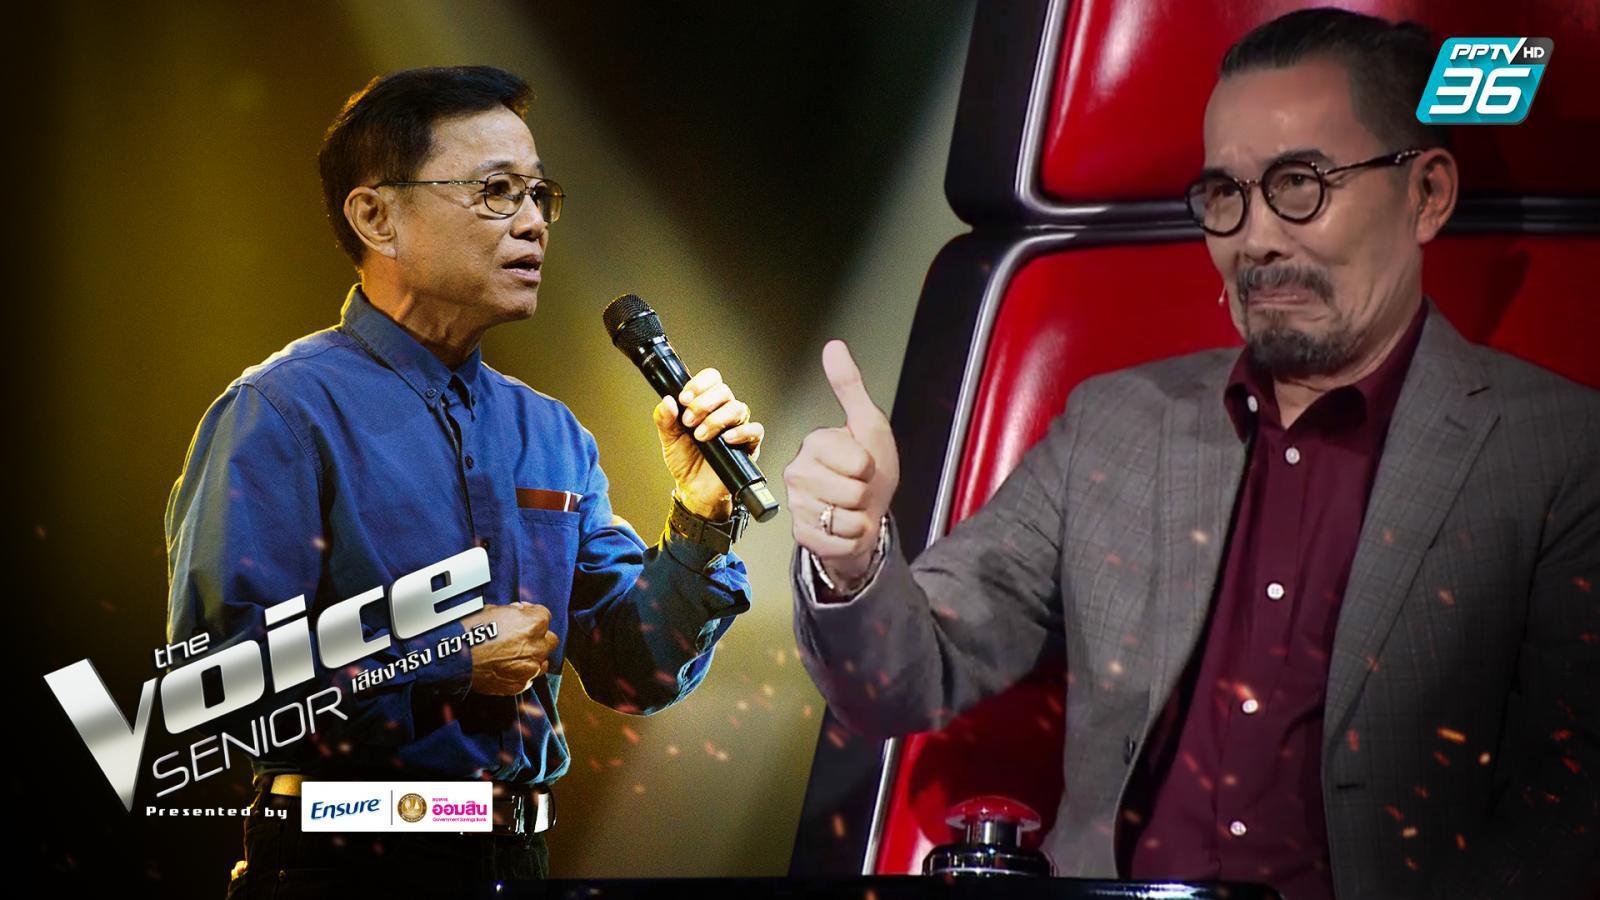 The Voice Senior Thailand 2020  EP.2 | อายุ 68 ปี แต่เสียงยังใสแจ๋วจนต้องยกนิ้ว